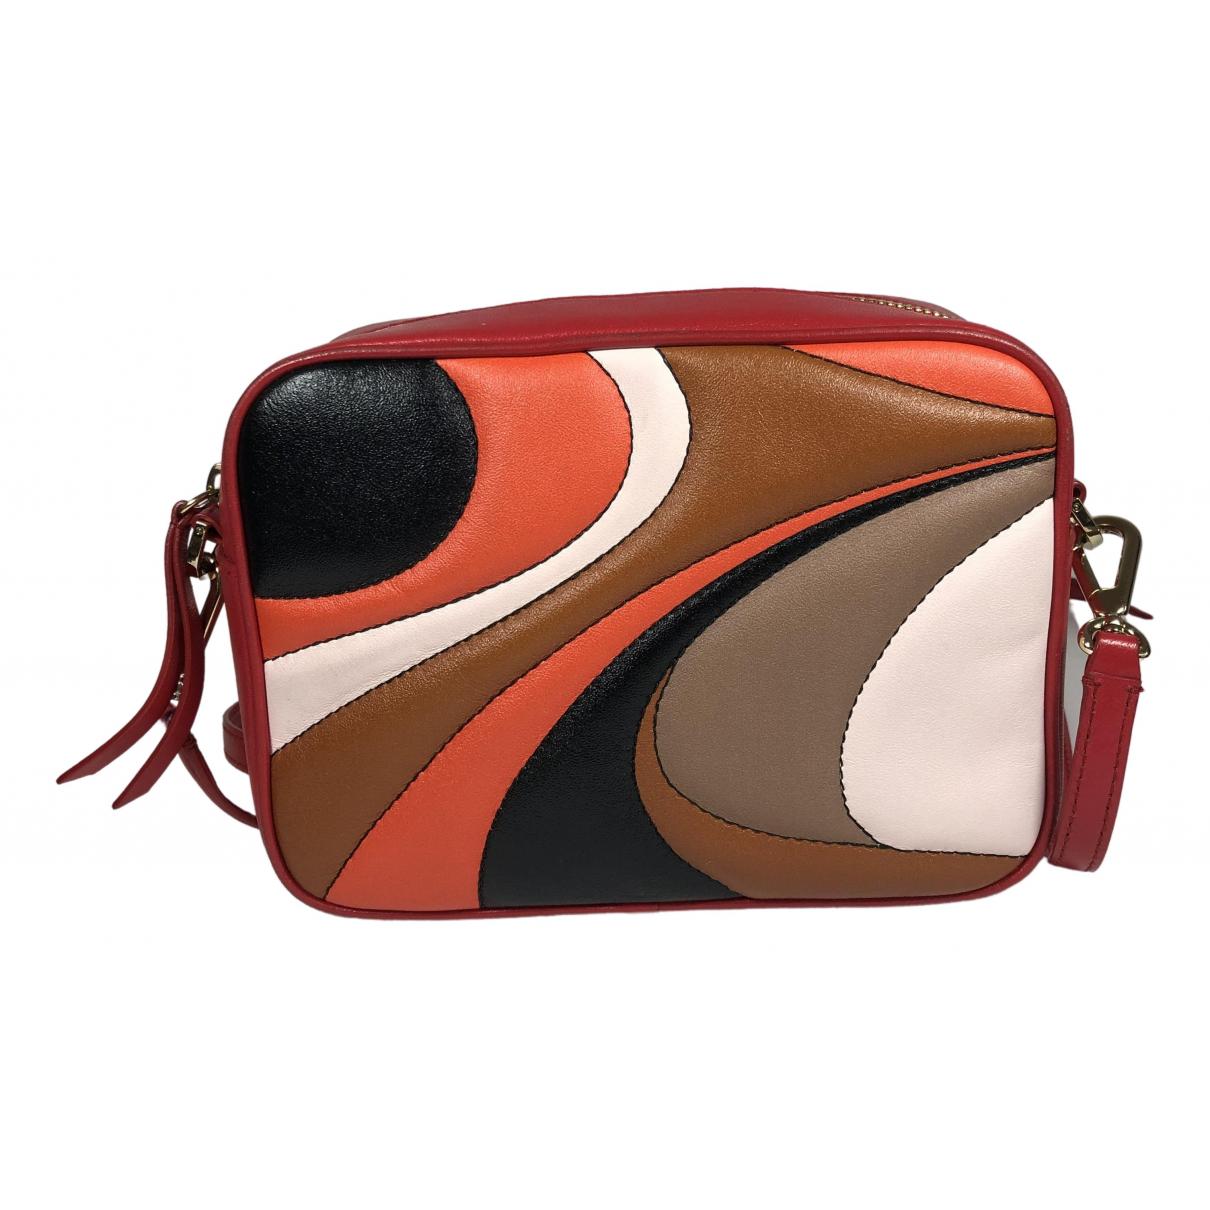 Emilio Pucci \N Multicolour Leather handbag for Women \N